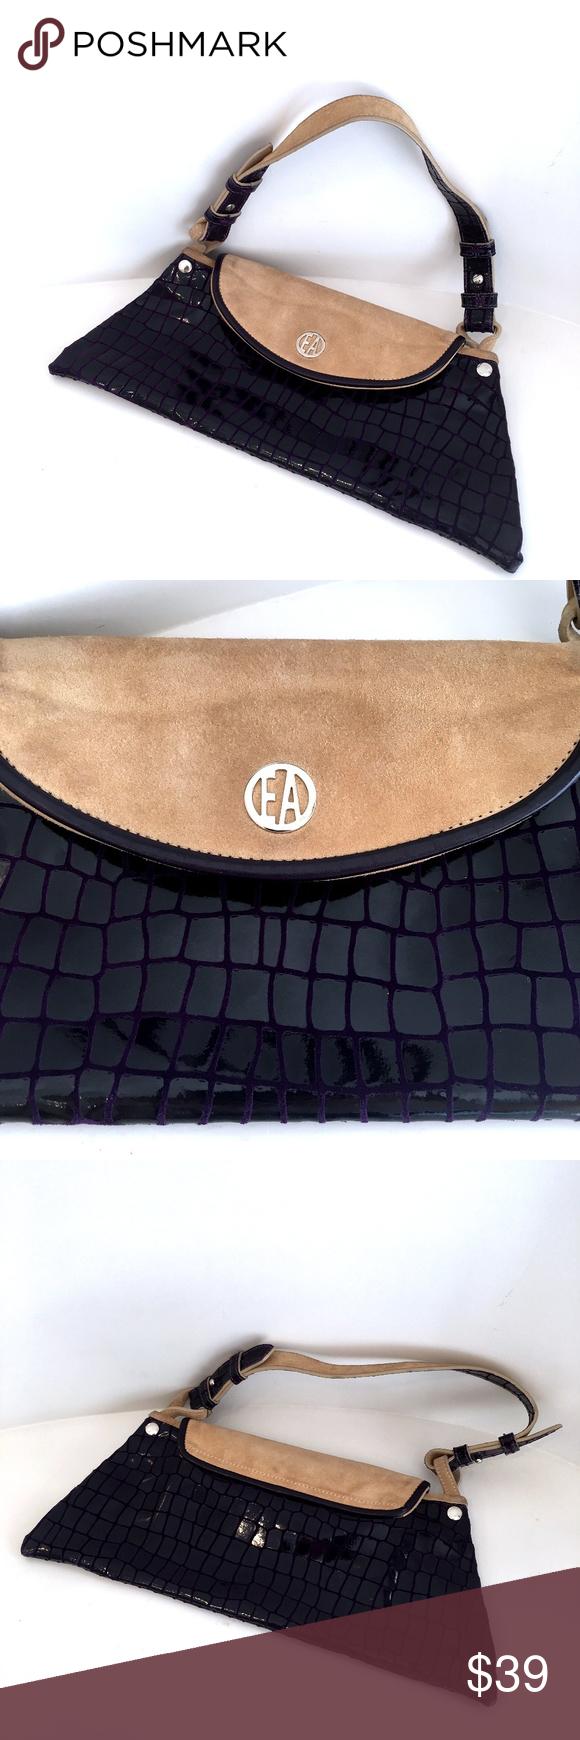 db6d15f99a1 EMPORIO ARMANI purple flat shoulder bag croco pr EMPORIO ARMANI purple flat  shoulder bag croco print